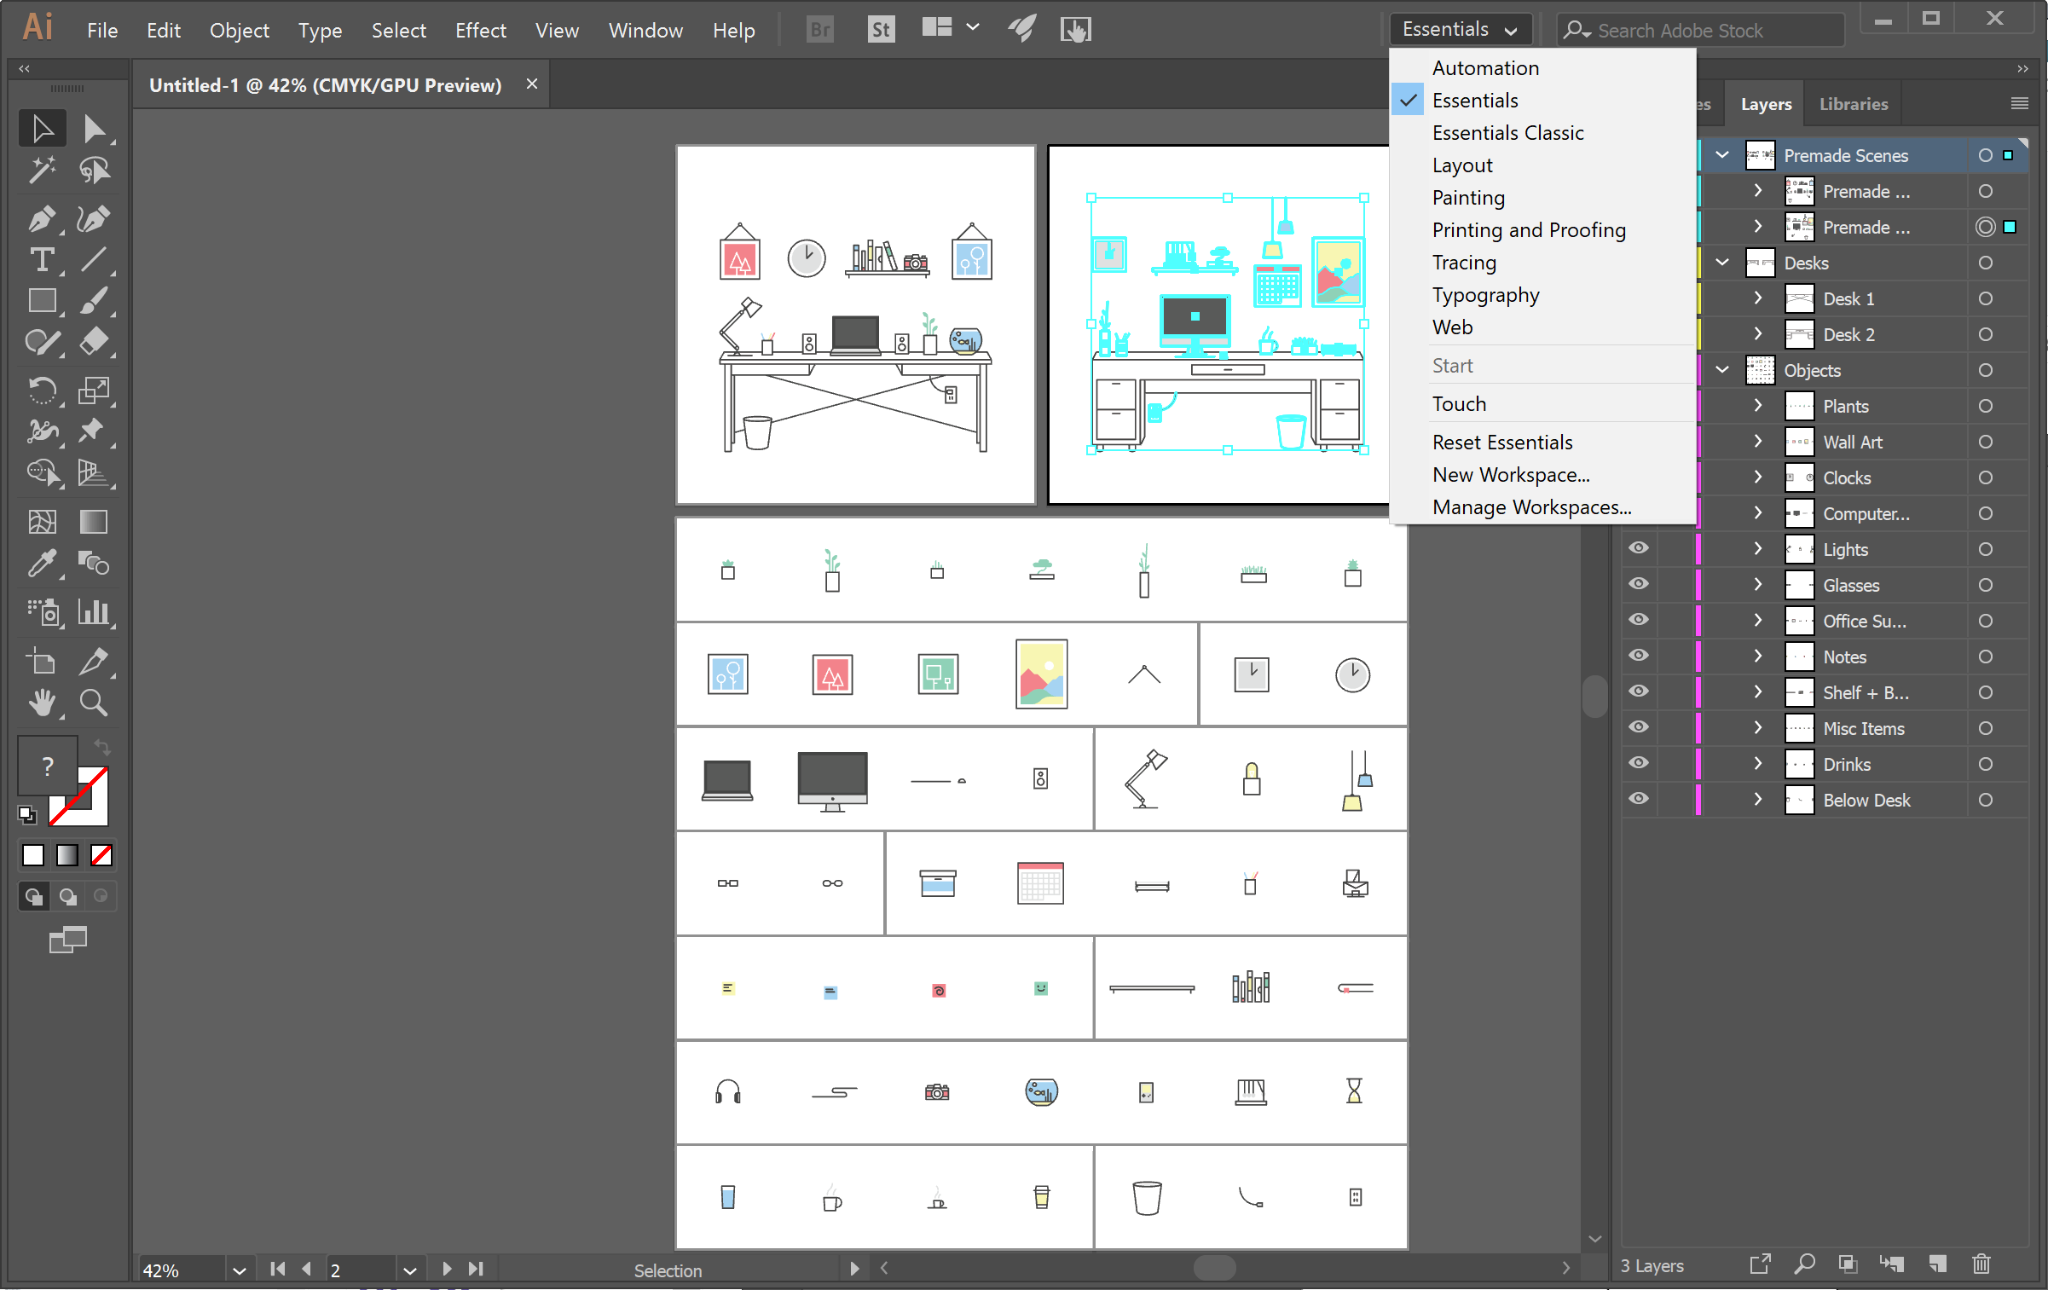 Adobe Illustrator software